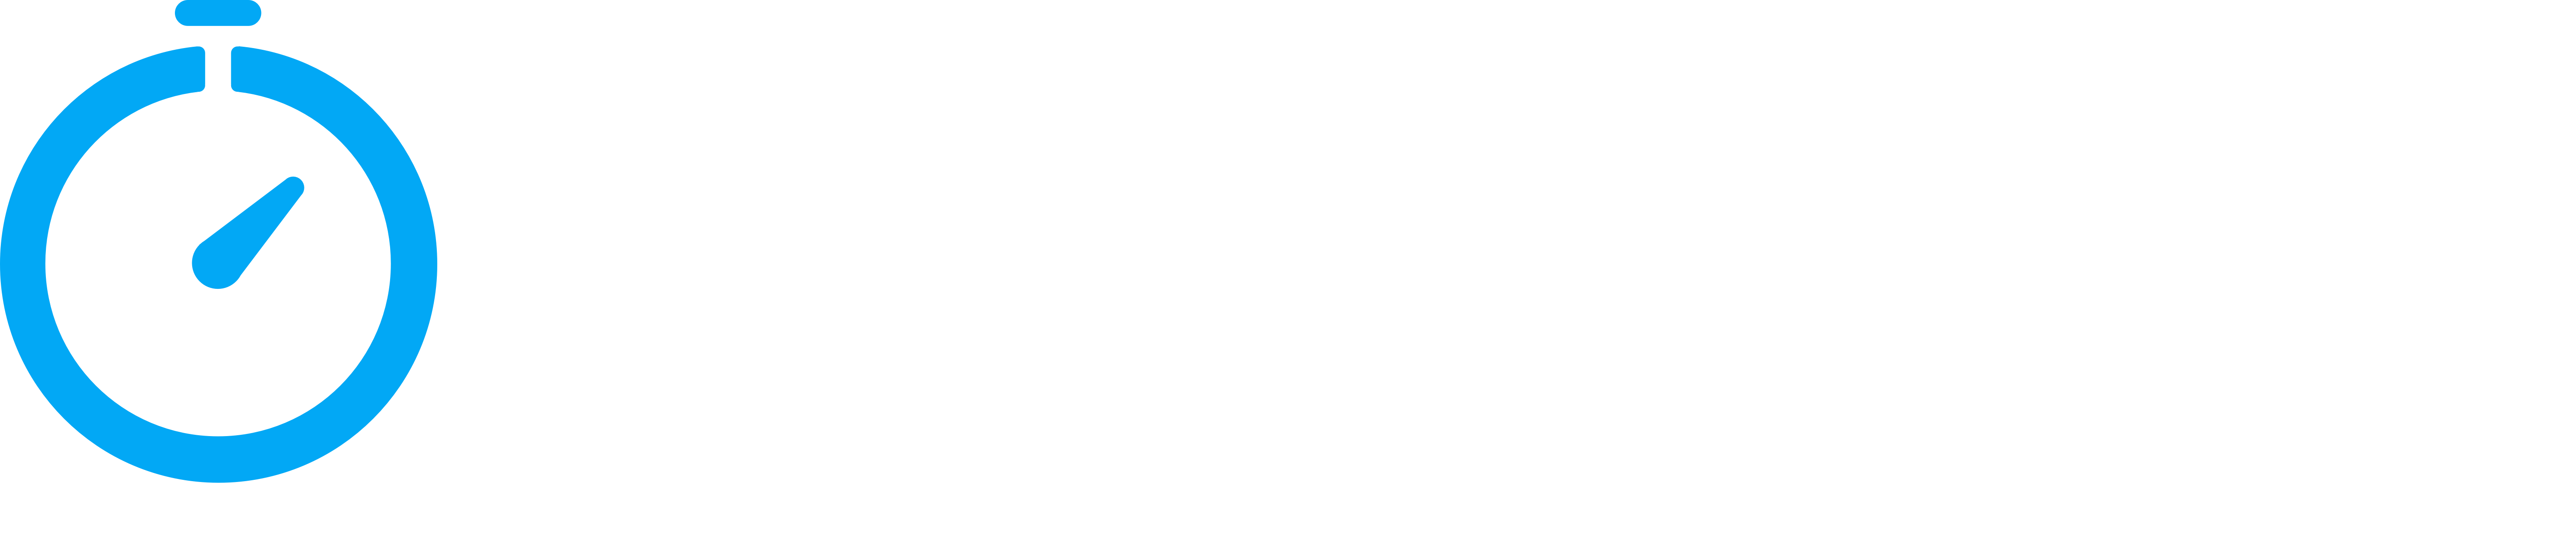 Icono TimeBilling Lemontech